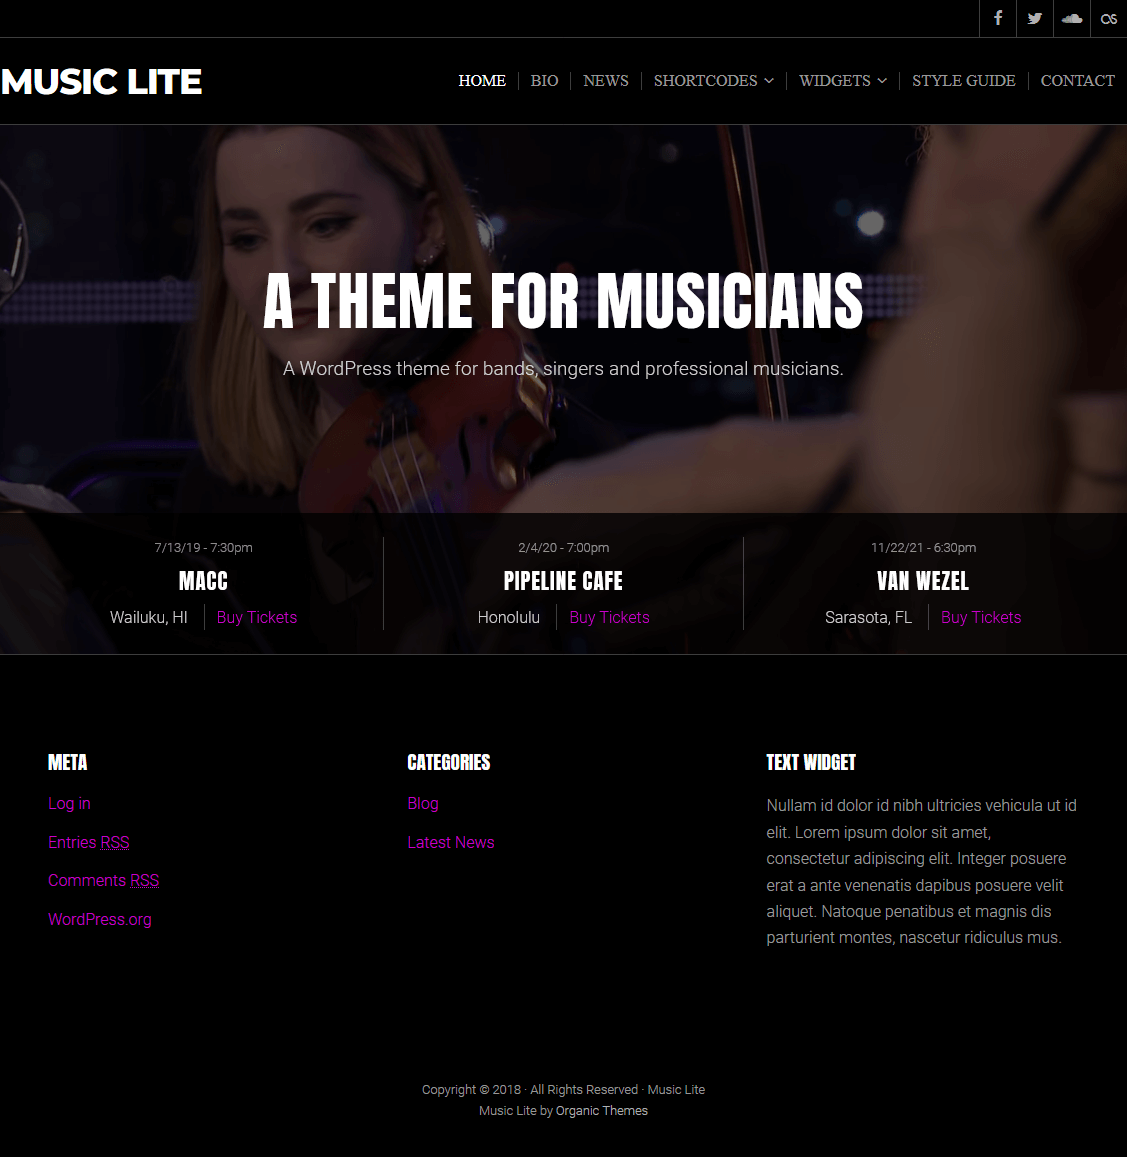 music lite best free wordpress themes january 2018 - 21+ Best Free WordPress Themes January 2018